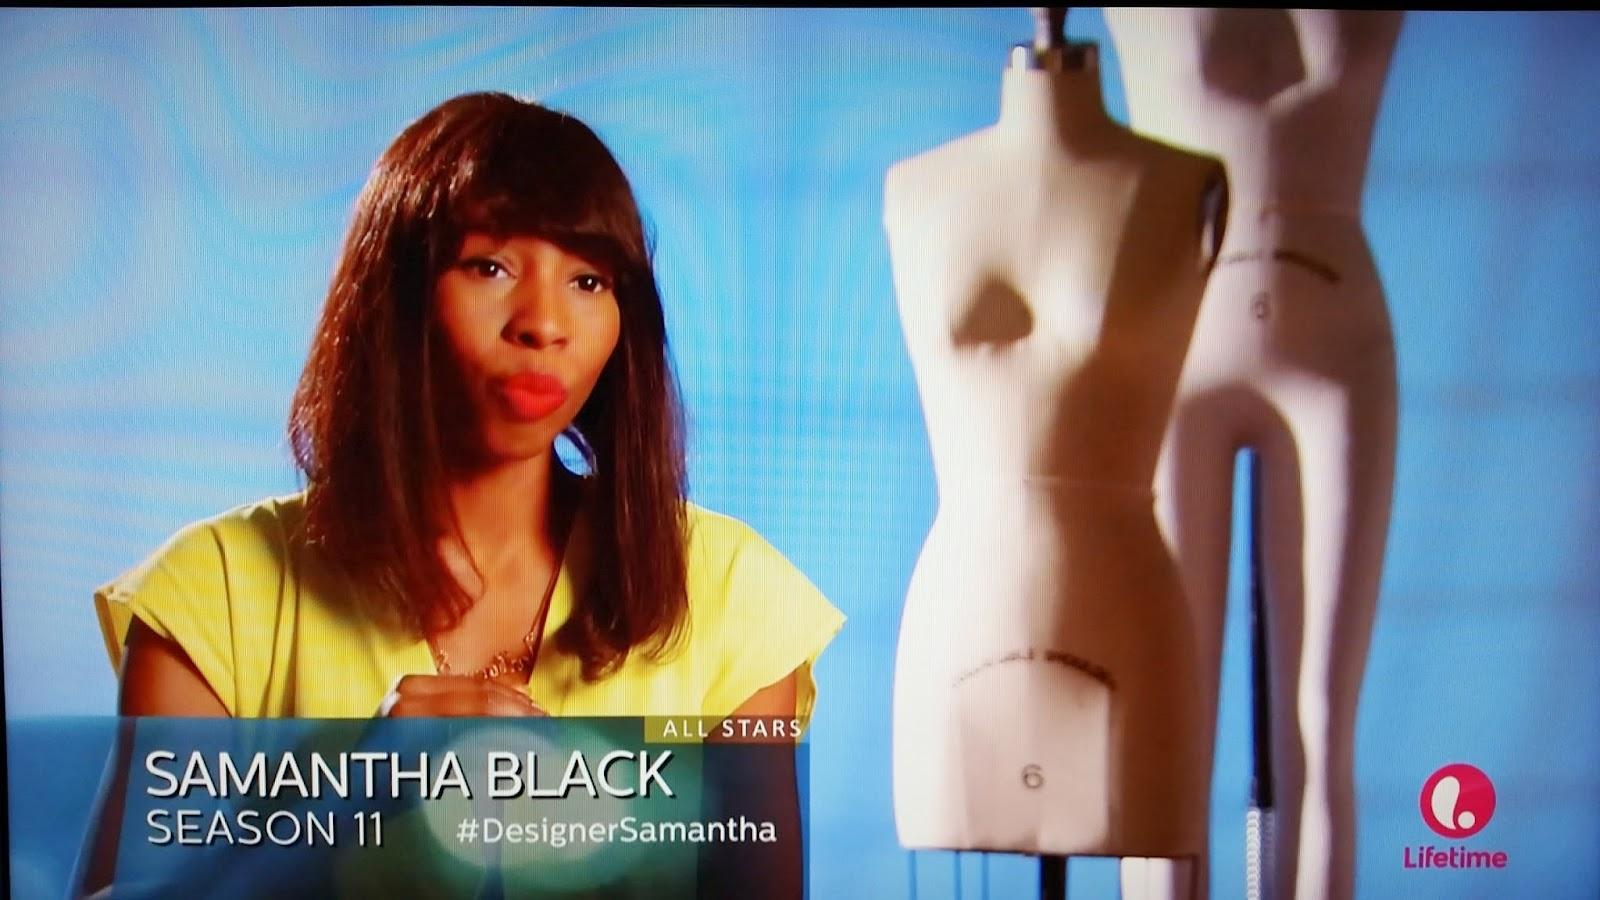 Project Runway All Stars Samantha Black recap